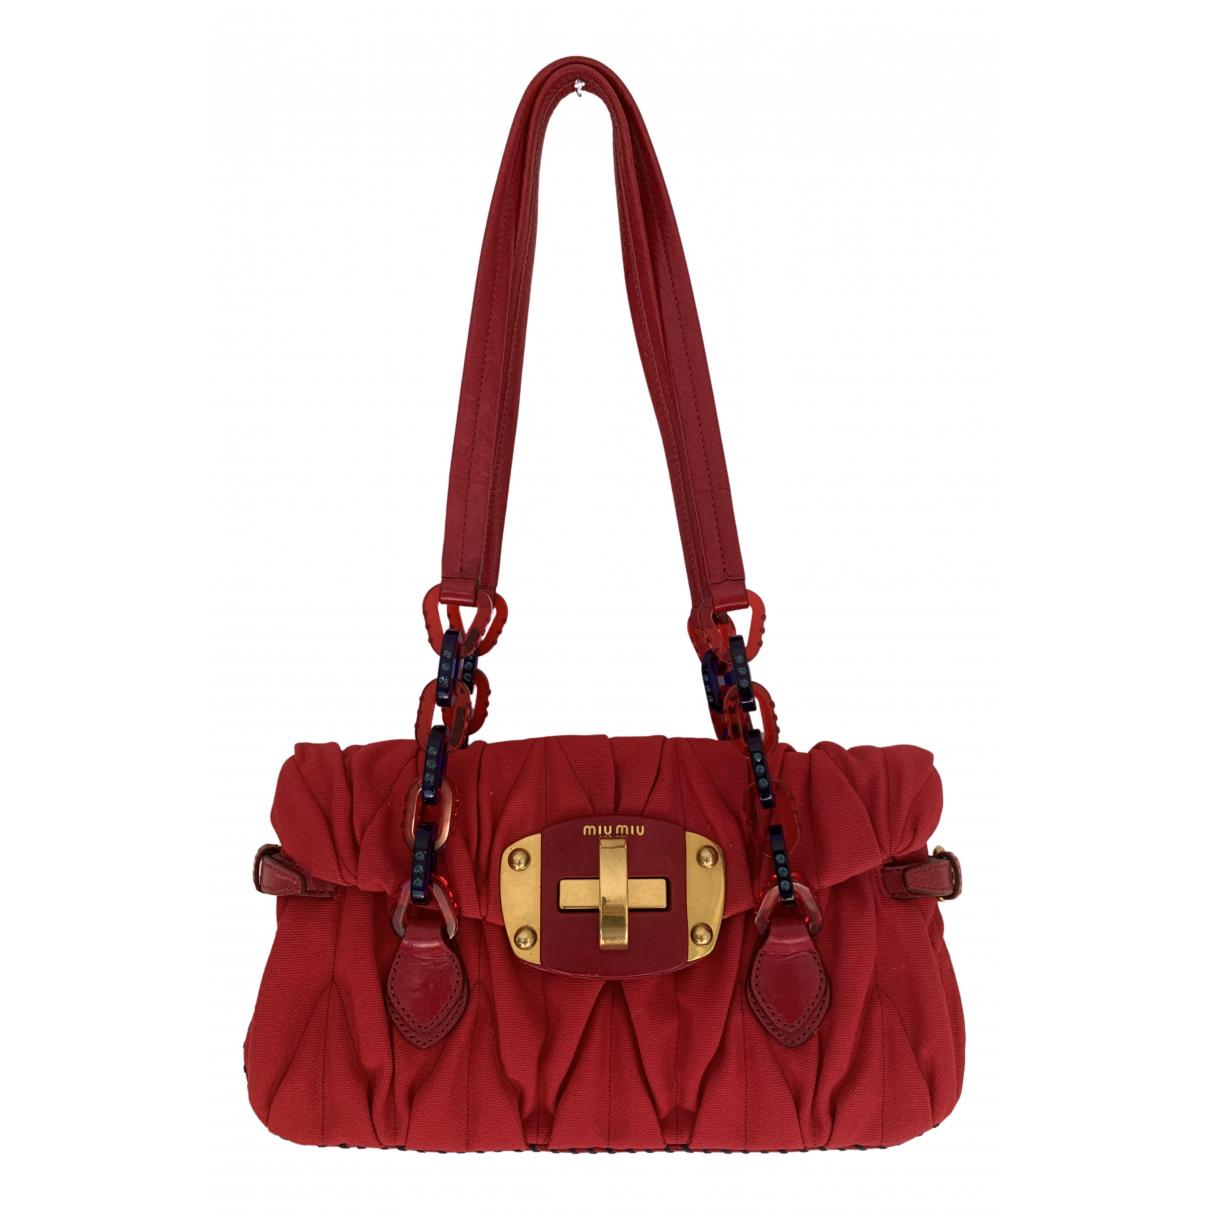 Miu Miu Matelasse Handtasche in  Rot Synthetik